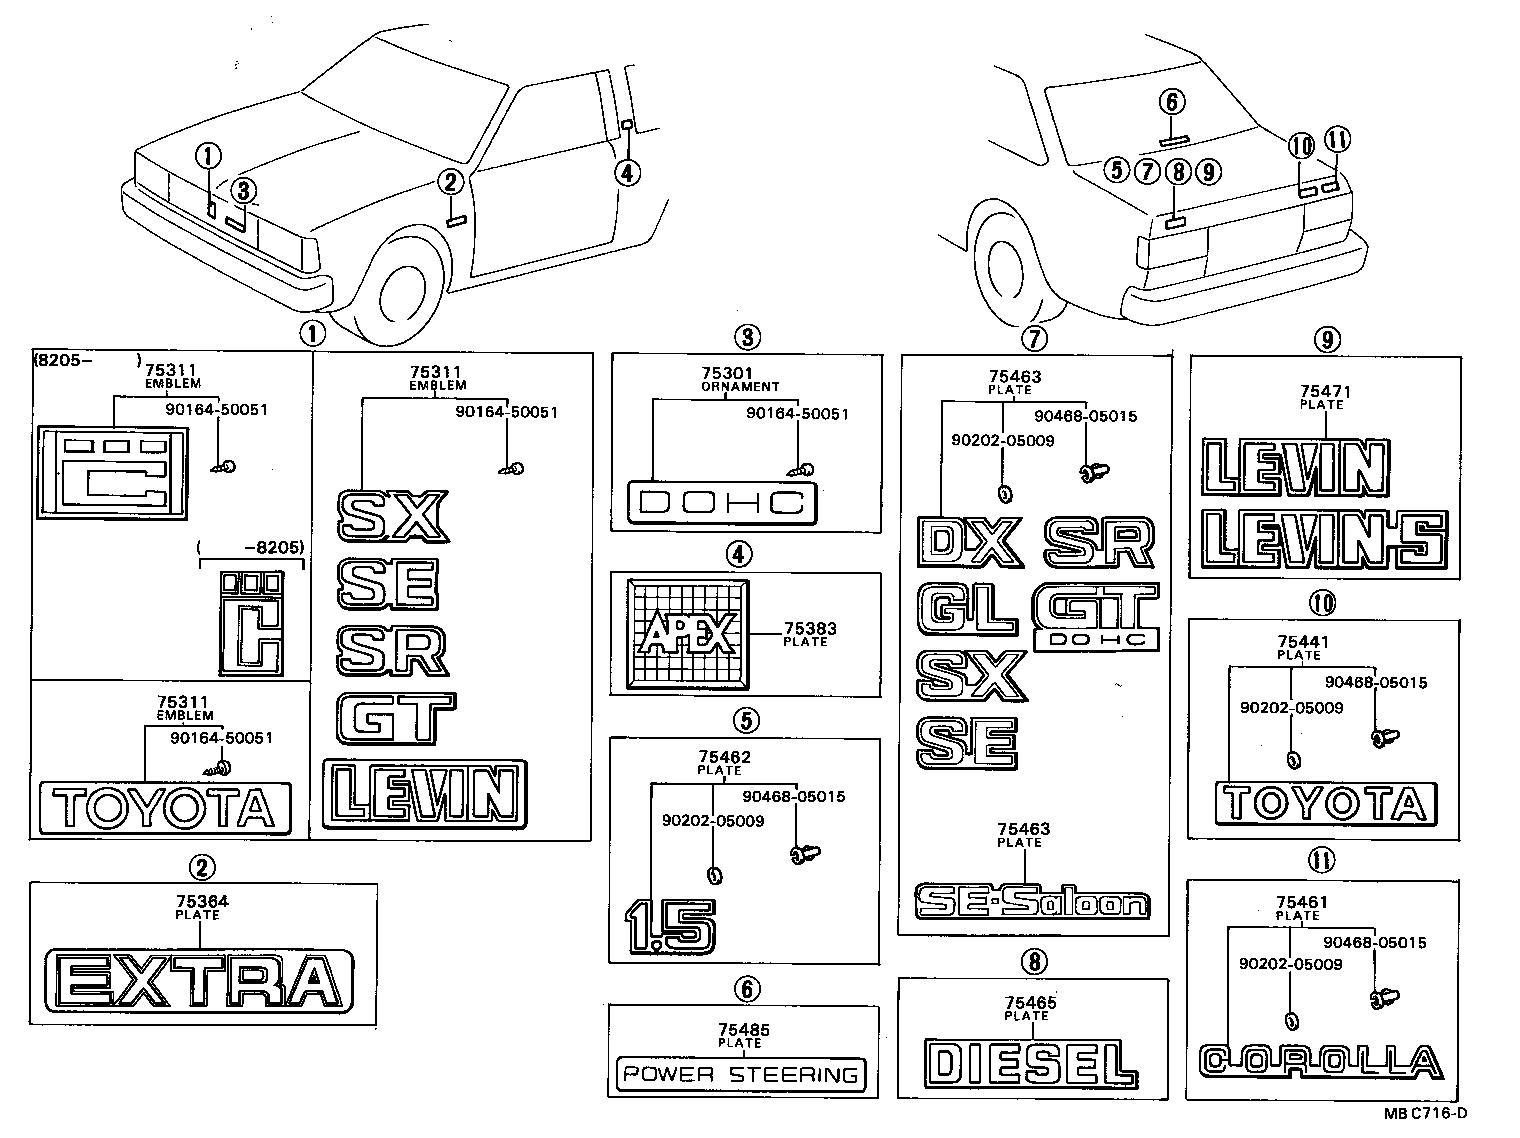 Toyota Corolla Interior Parts Diagram Toyota Auto Parts